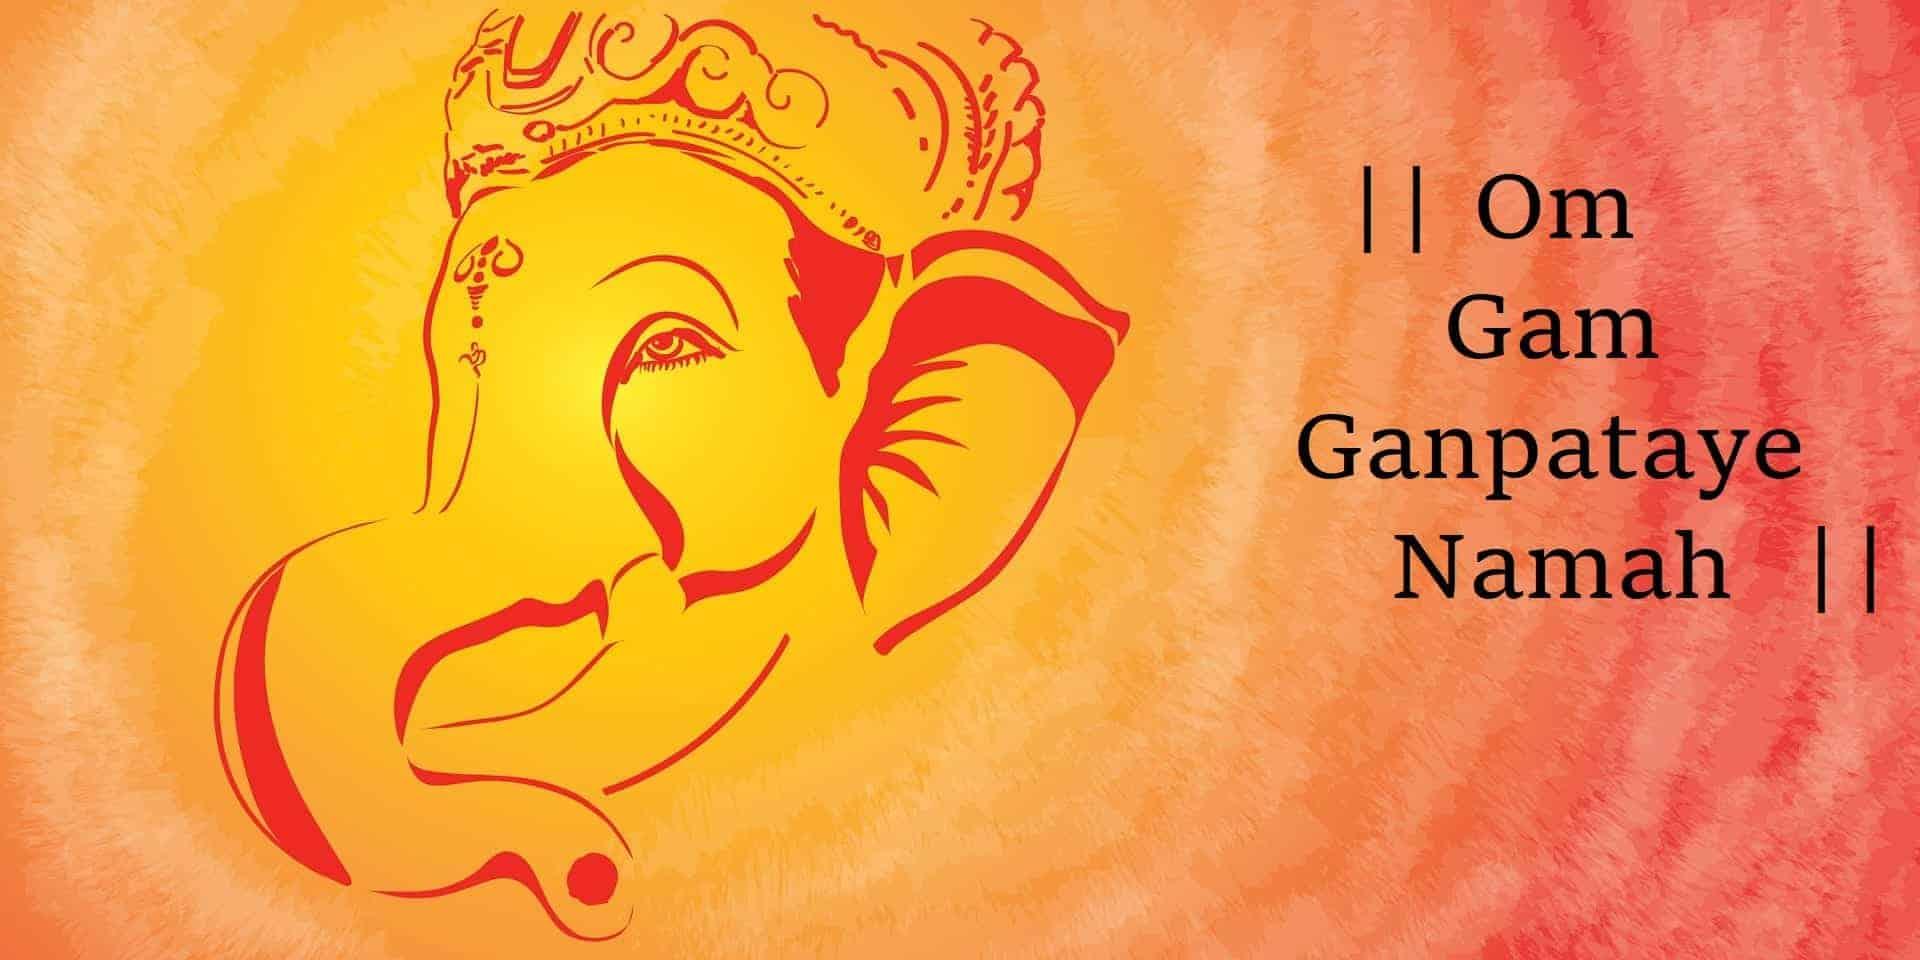 Find top 10 Ganpati Mantras